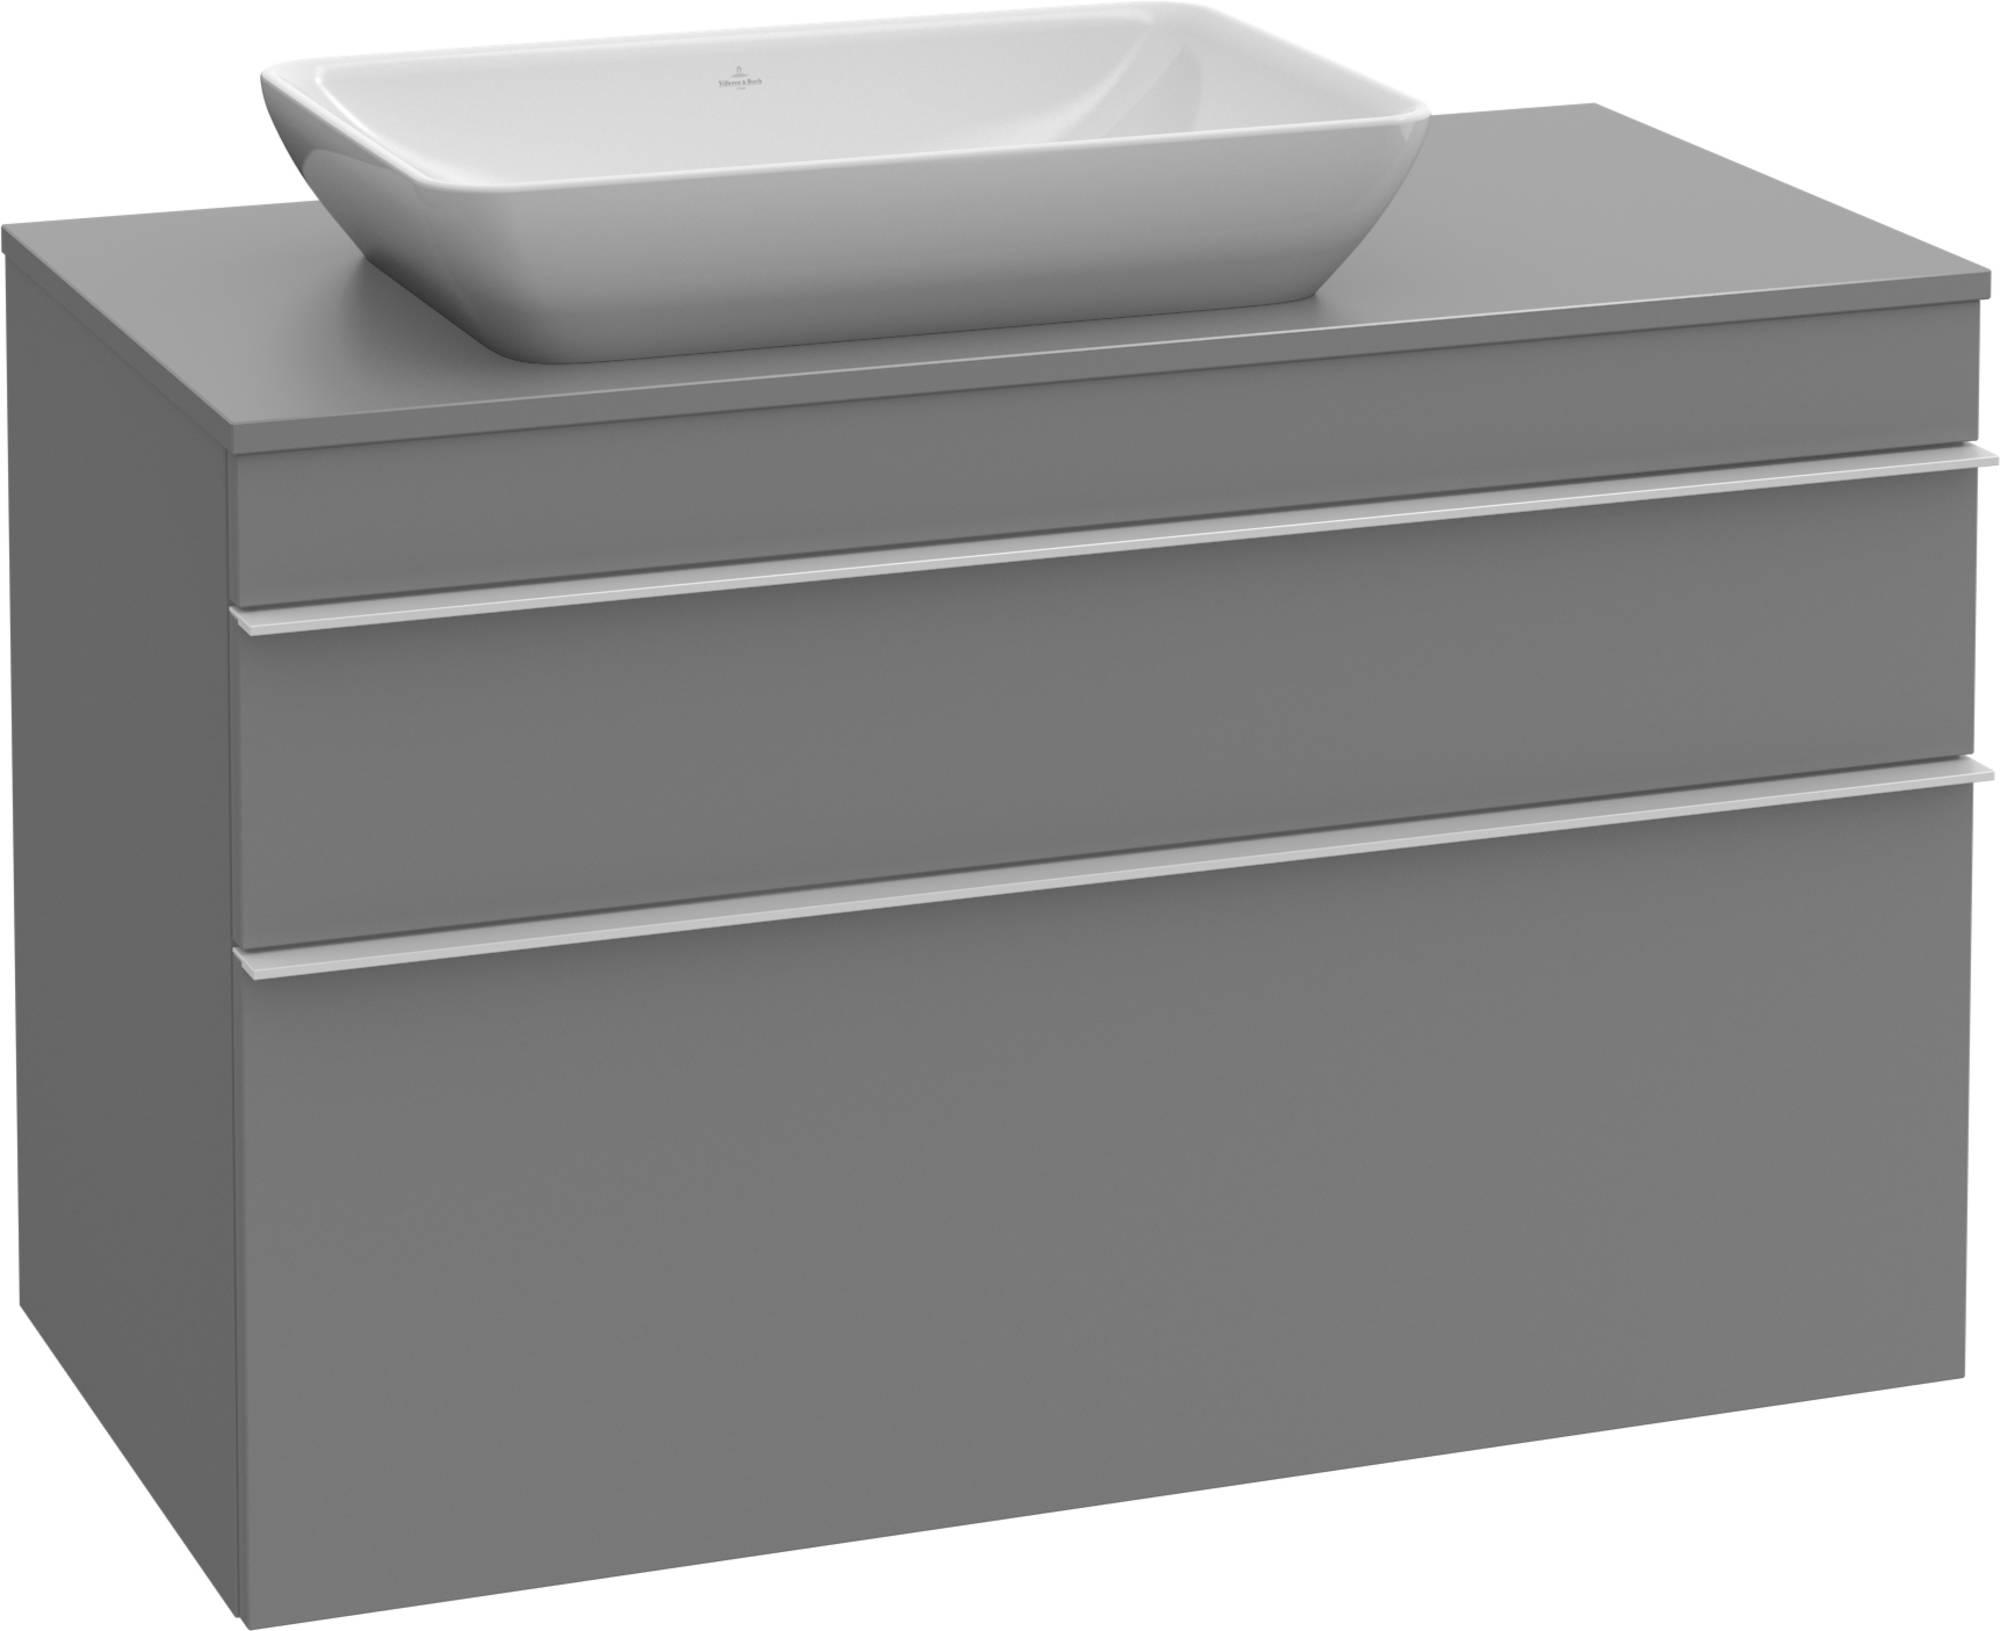 Villeroy&Boch Venticello Wastafelonderkast 95,7x50,2x60,6  cm  Glossy Grey